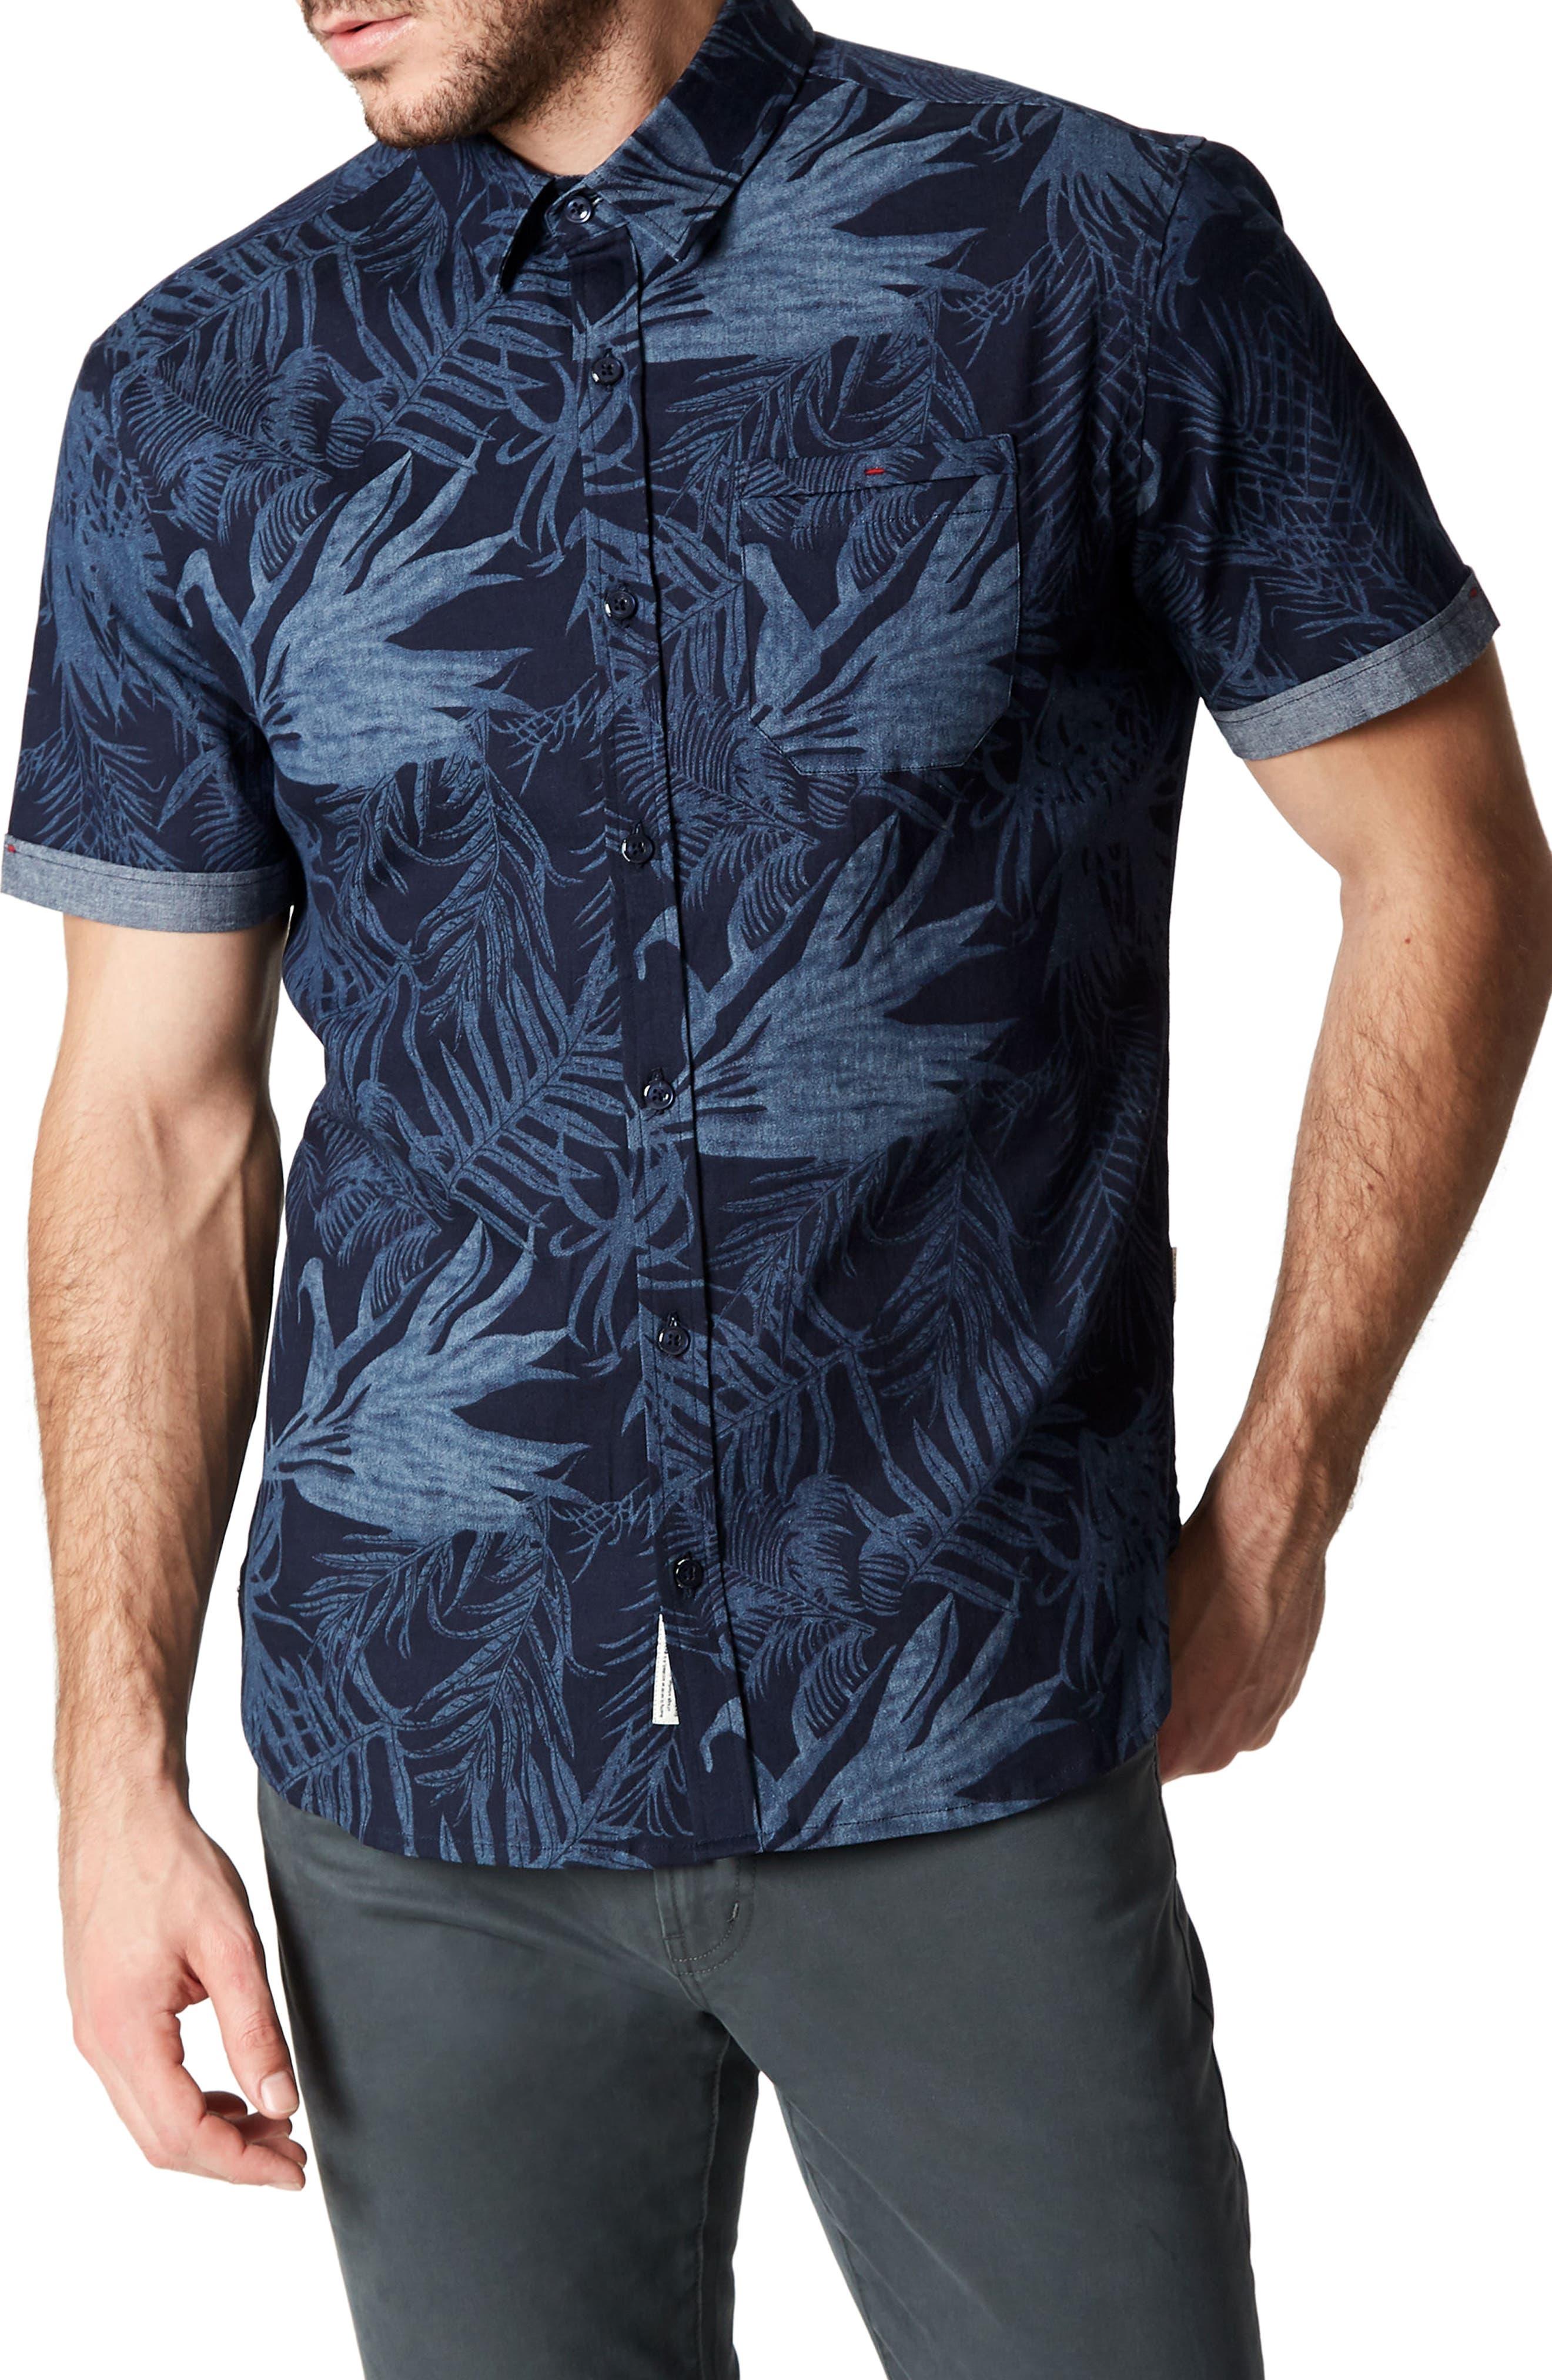 Feeling Good Woven Shirt,                             Main thumbnail 1, color,                             NAVY